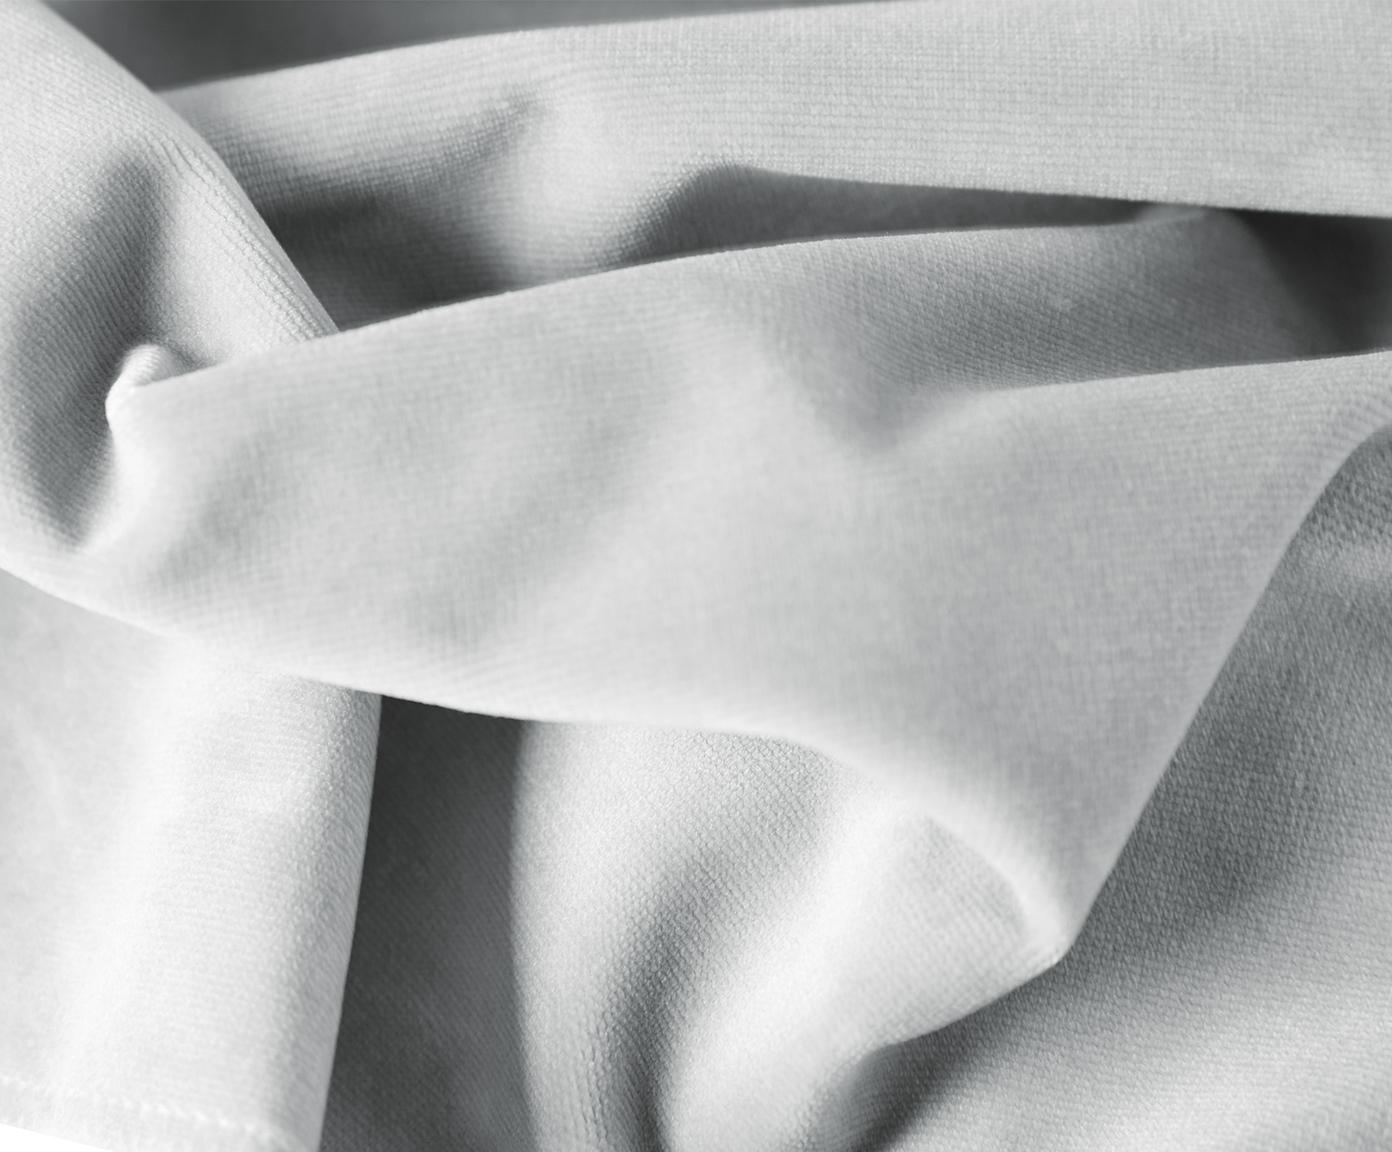 Samt-Ecksofa Fluente, Bezug: Samt (Hochwertiger Polyes, Gestell: Massives Kiefernholz, Füße: Metall, lackiert, Samt Hellgrau, B 221 x T 200 cm